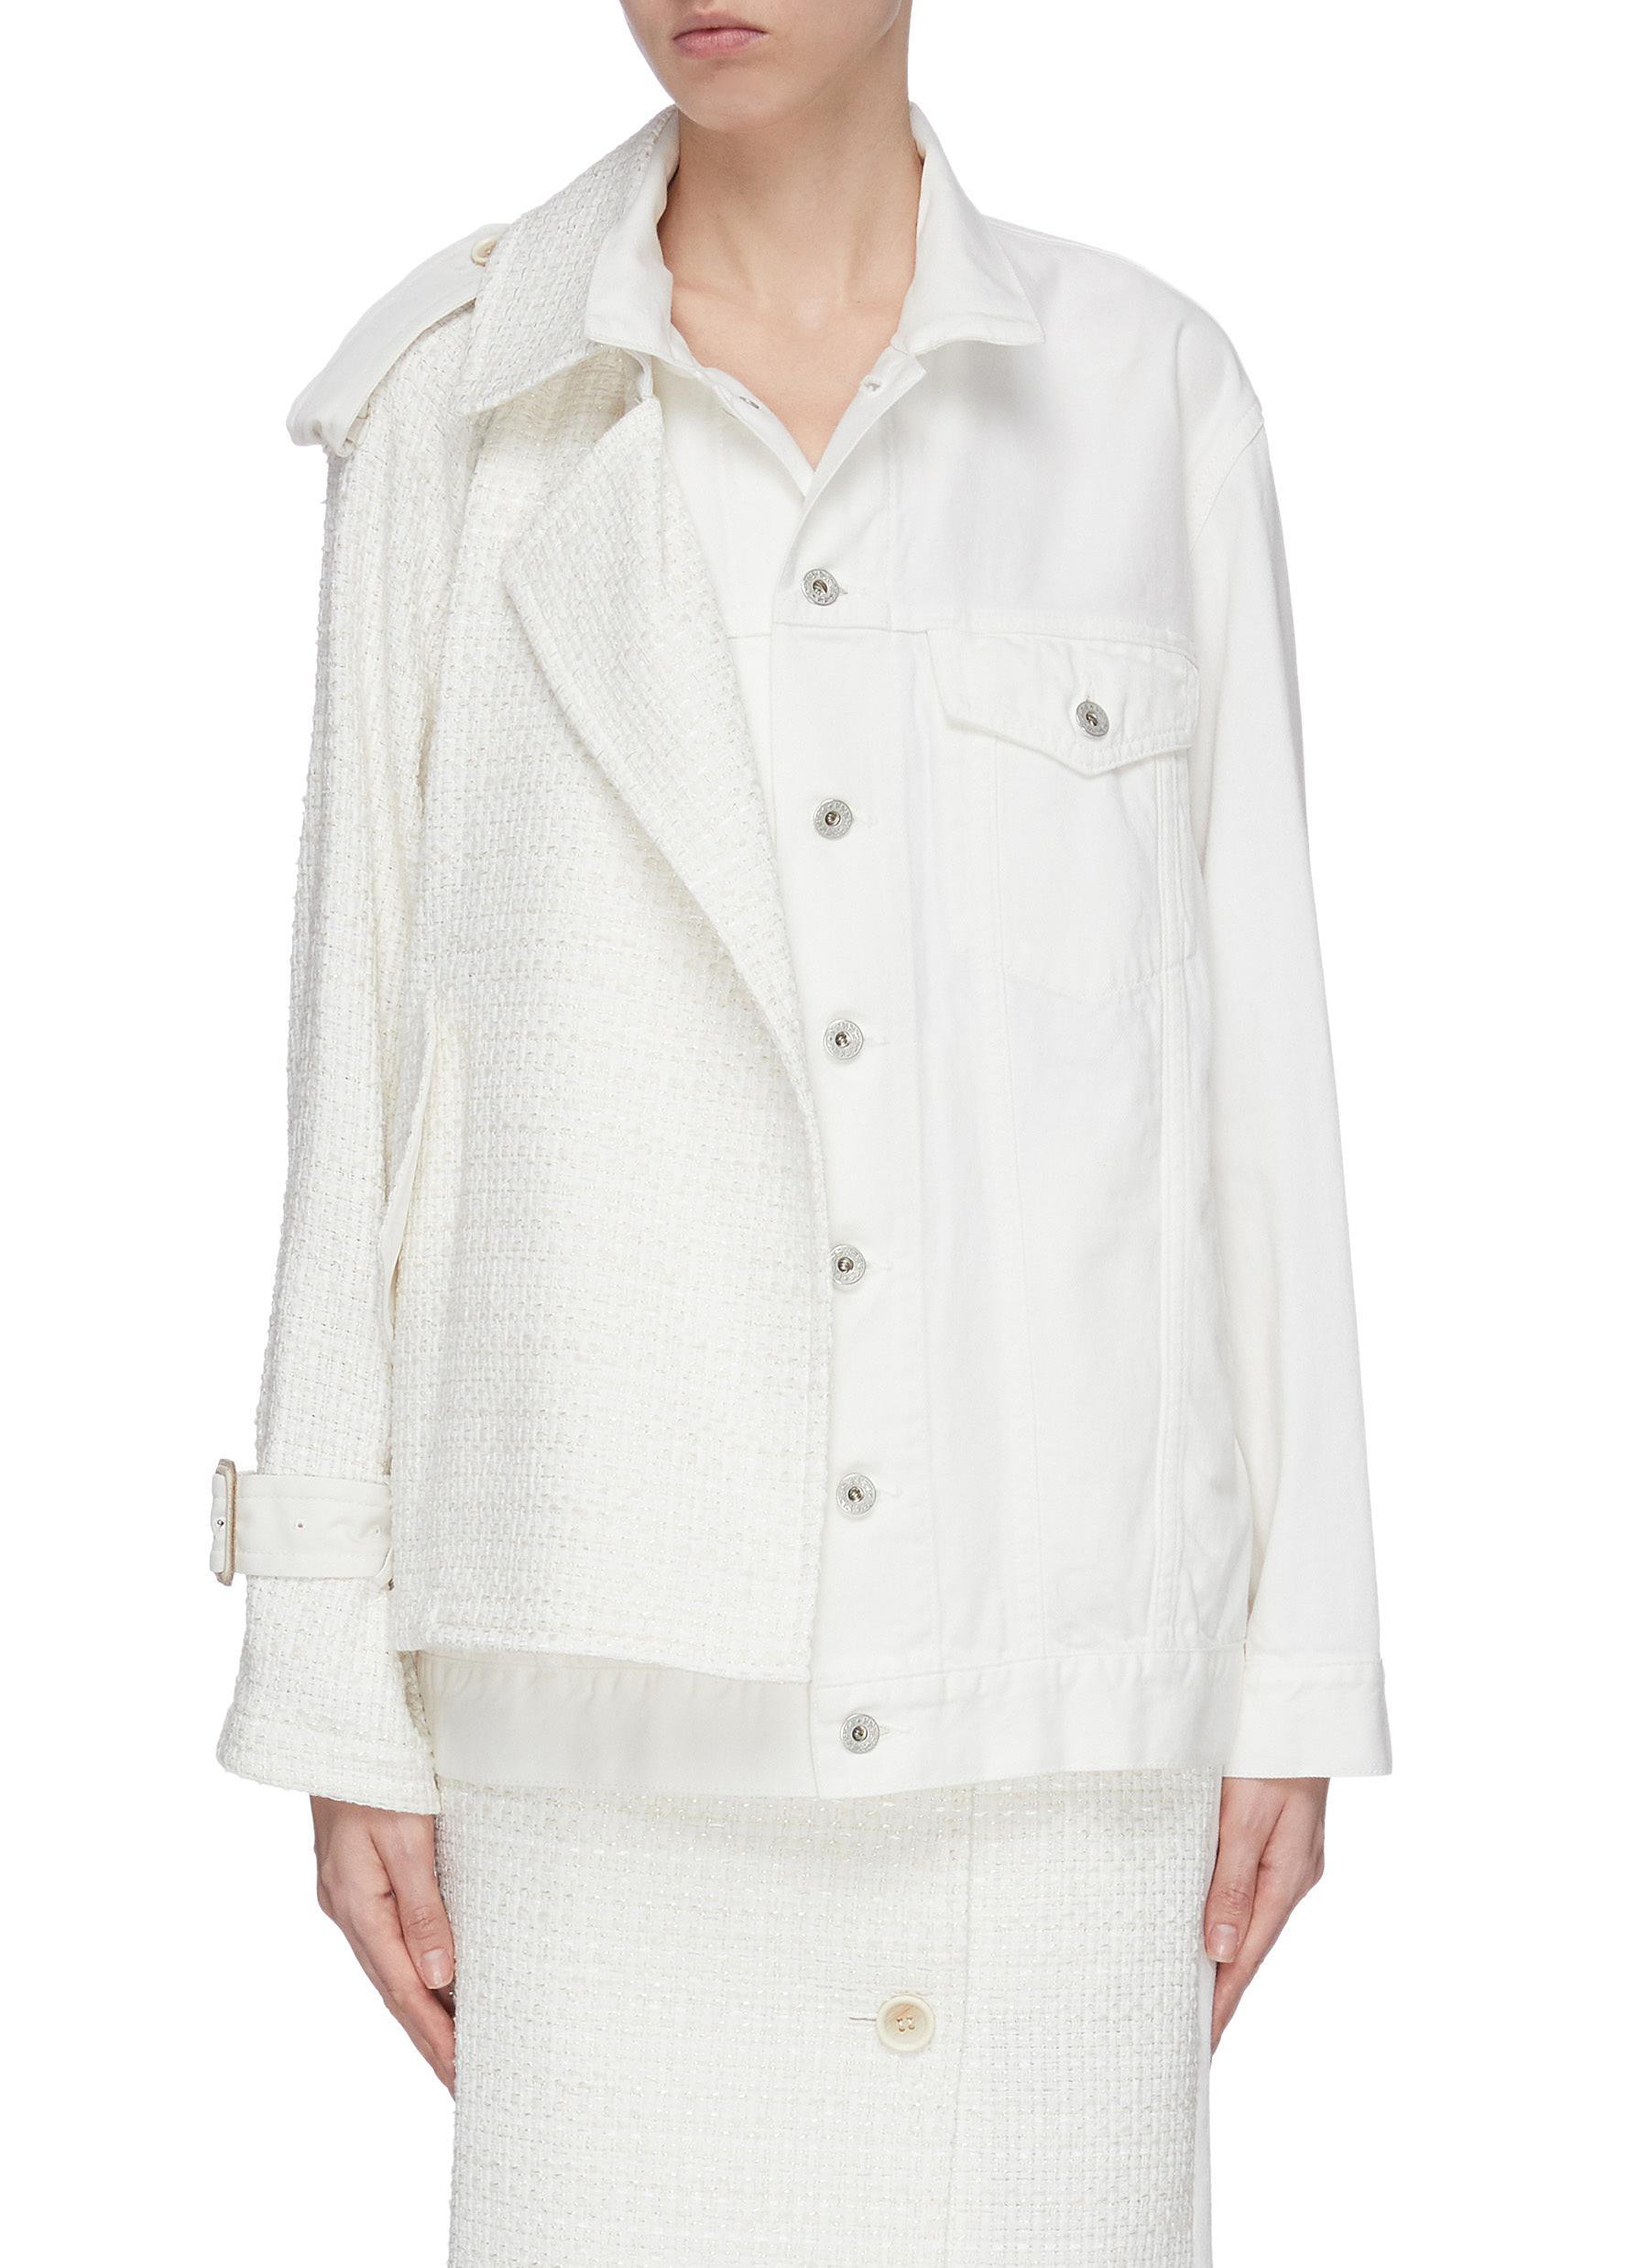 Buy The Keiji Jackets Tweed panel denim jacket